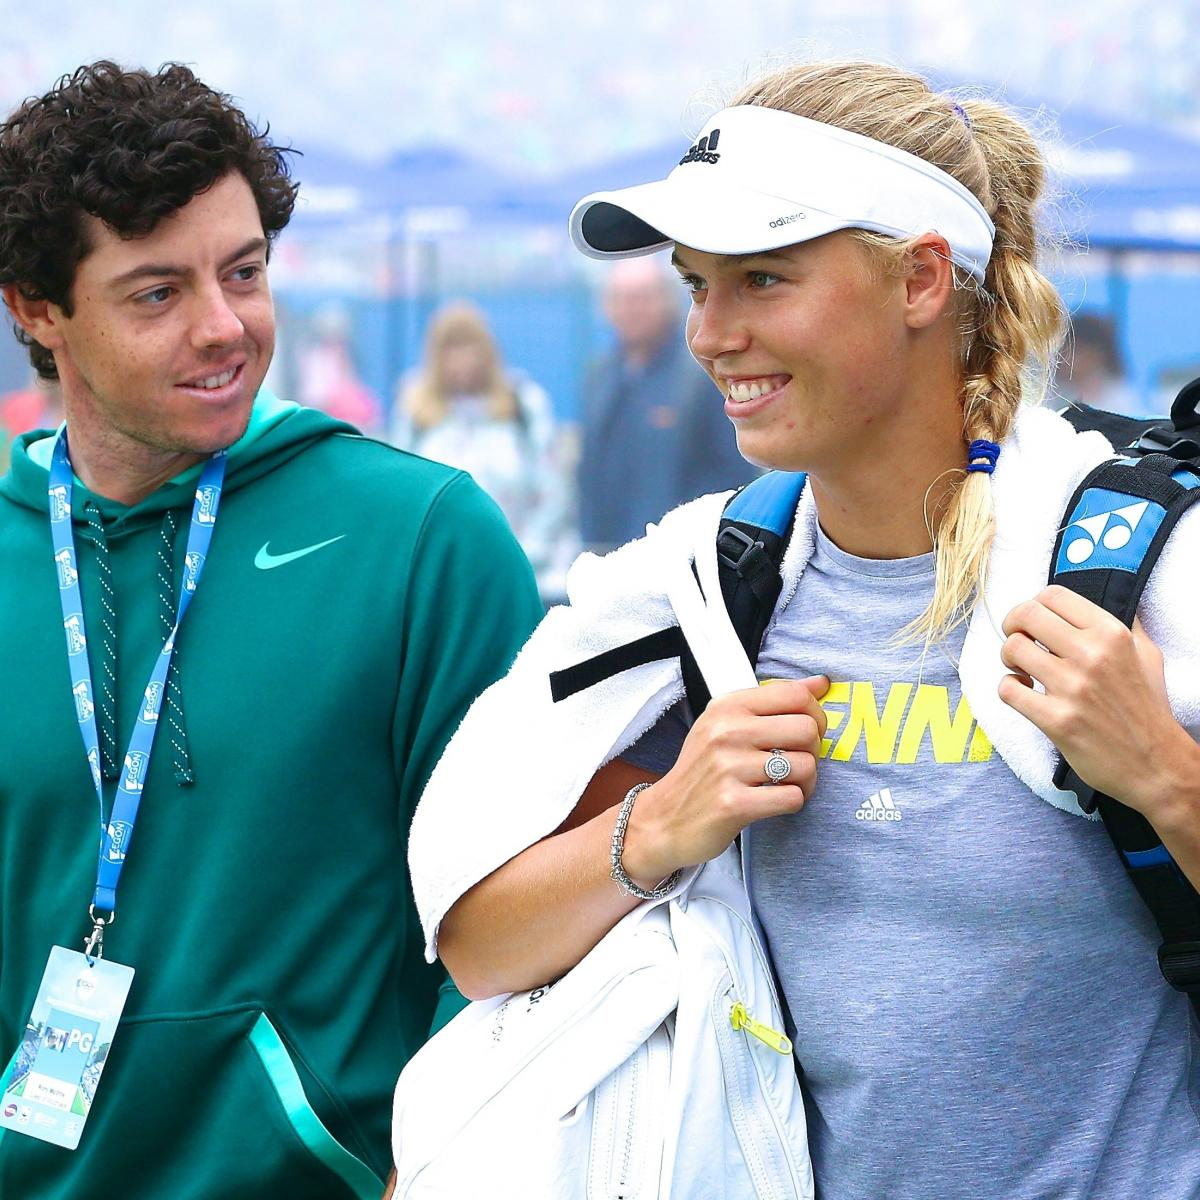 Caroline Wozniacki Announces Engagement To Rory McIlroy On